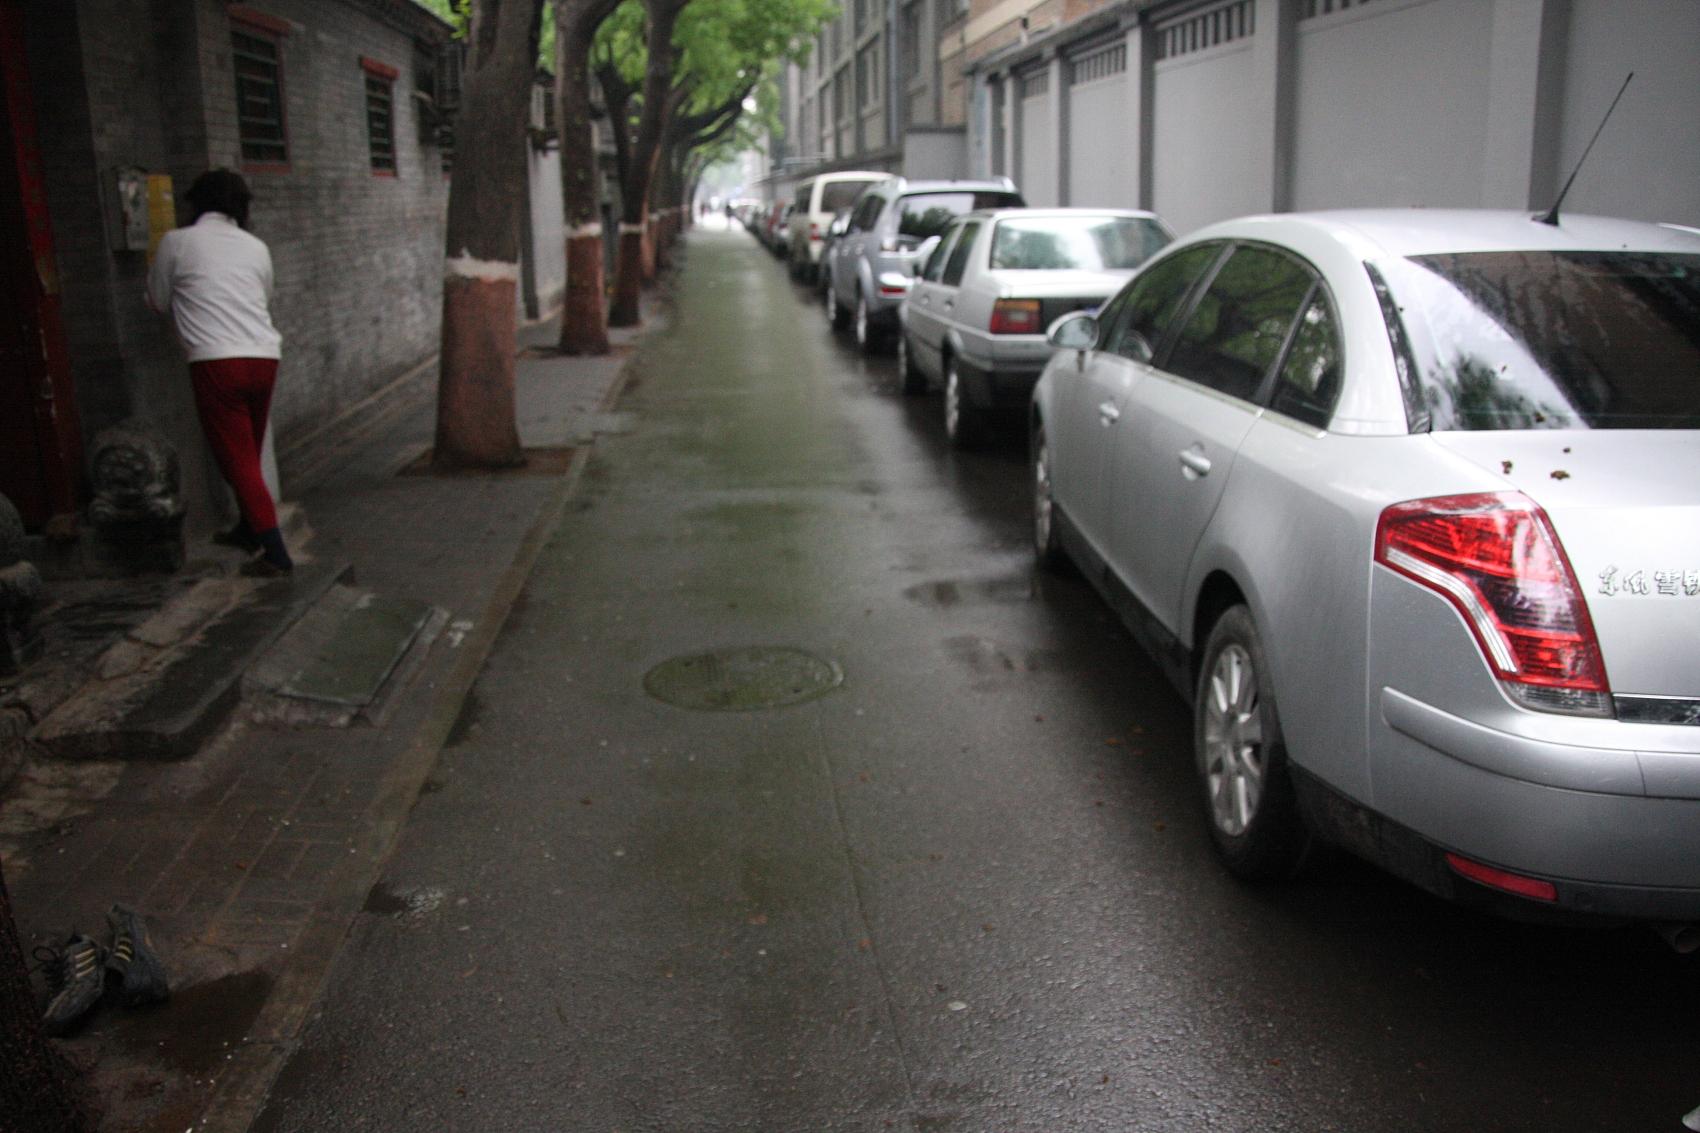 Beijing to ban vehicles in narrow traditional alleyways